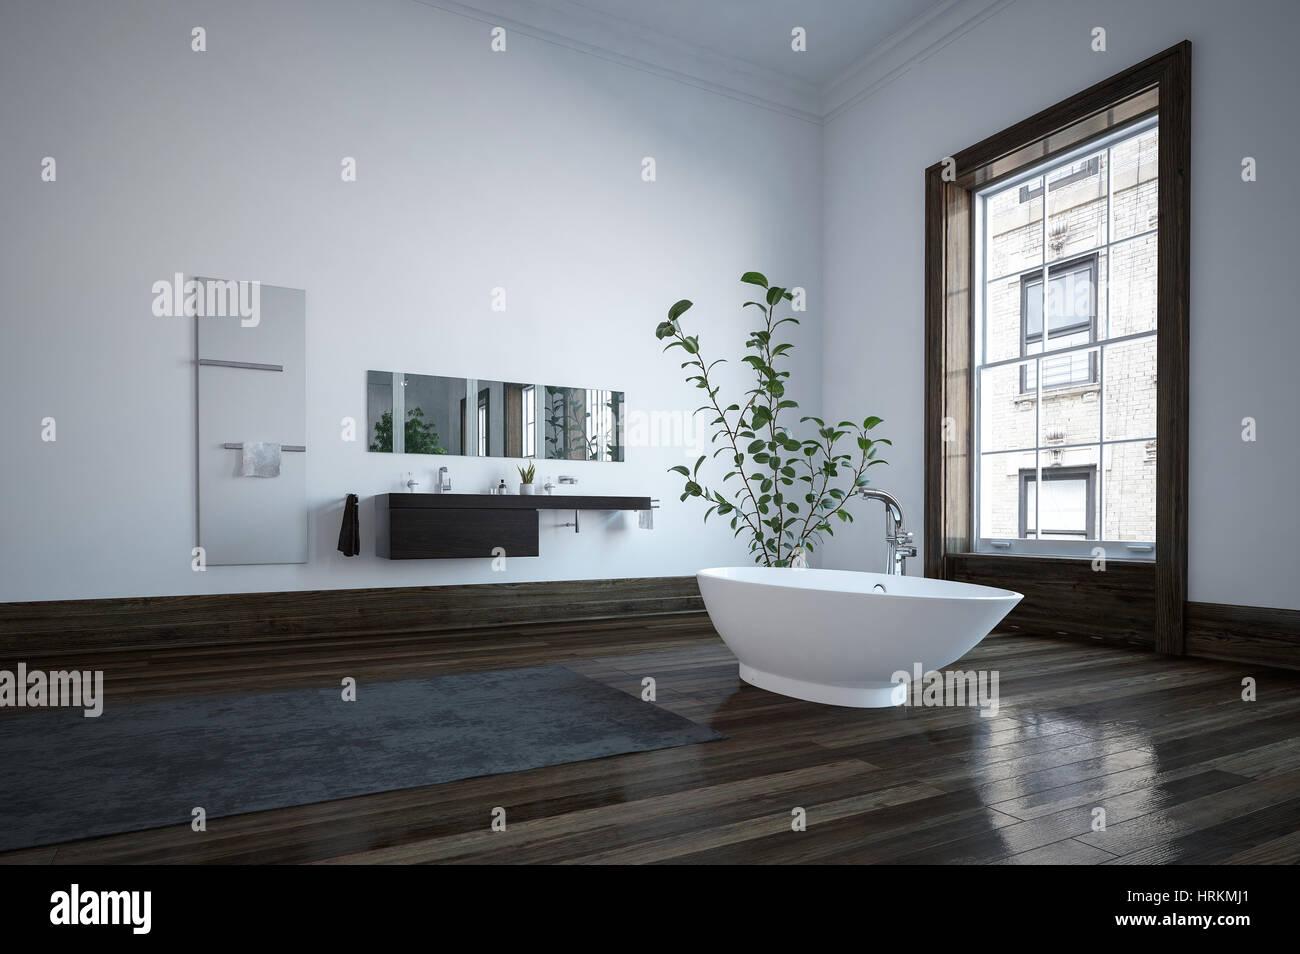 Spacious Bathroom In Minimalist Interior Design With Modern Freestanding Bath White Walls Dark Wooden Floor And Huge Window 3d Rendering